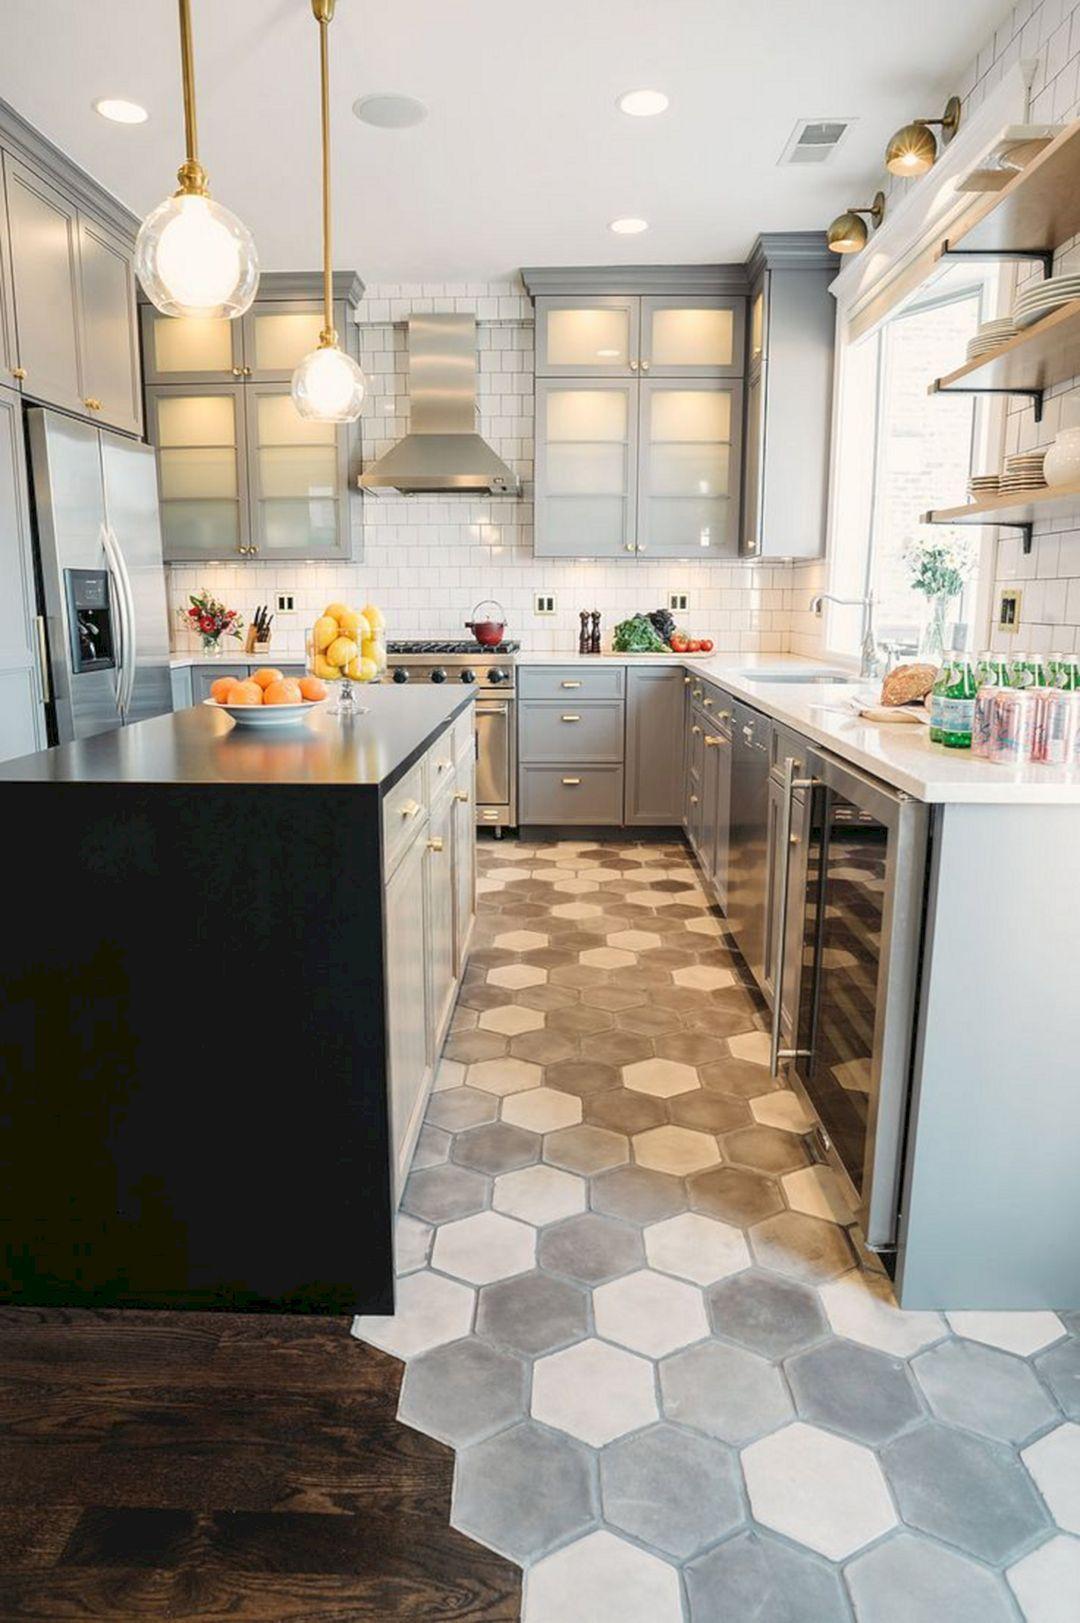 18 Best Floor Kitchen Tile Ideas That Make You Amazed In 2020 Hexagon Tile Kitchen Kitchen Flooring Kitchen Floor Tile